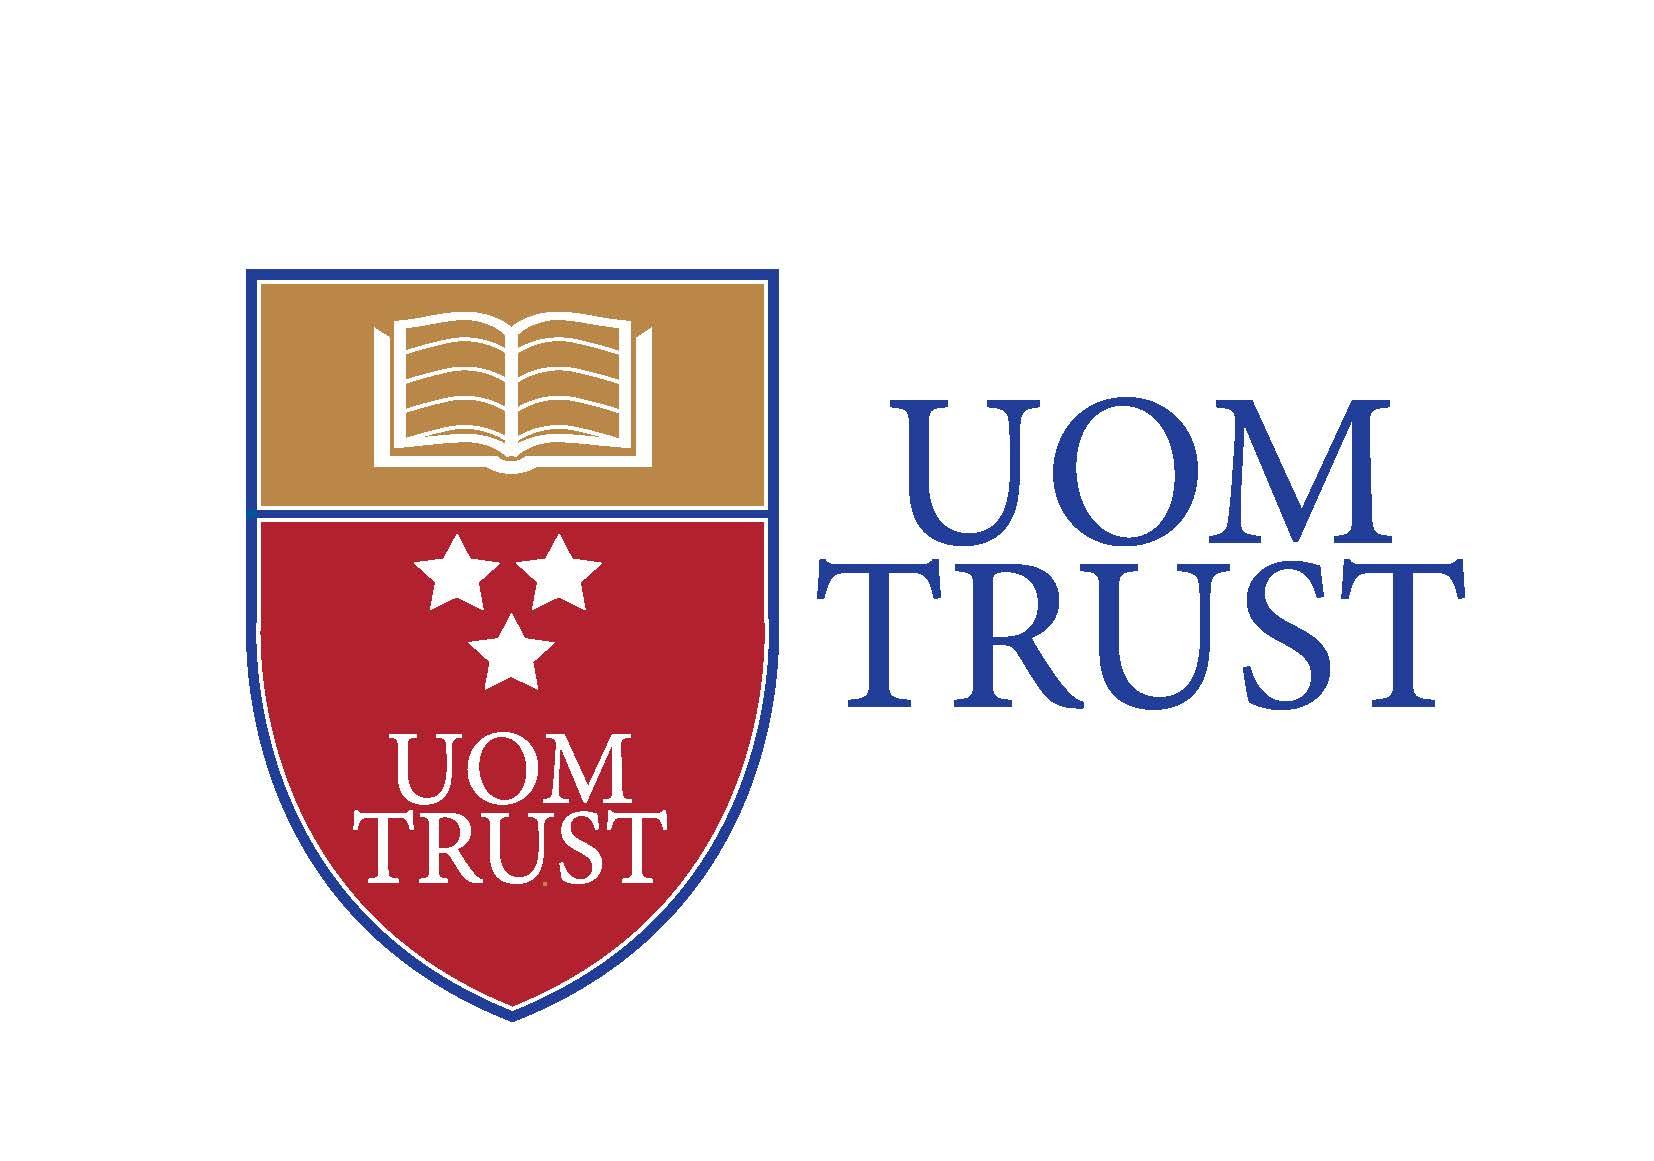 2014/2015 IDRC Masters Scholarship at the University of Mauritius